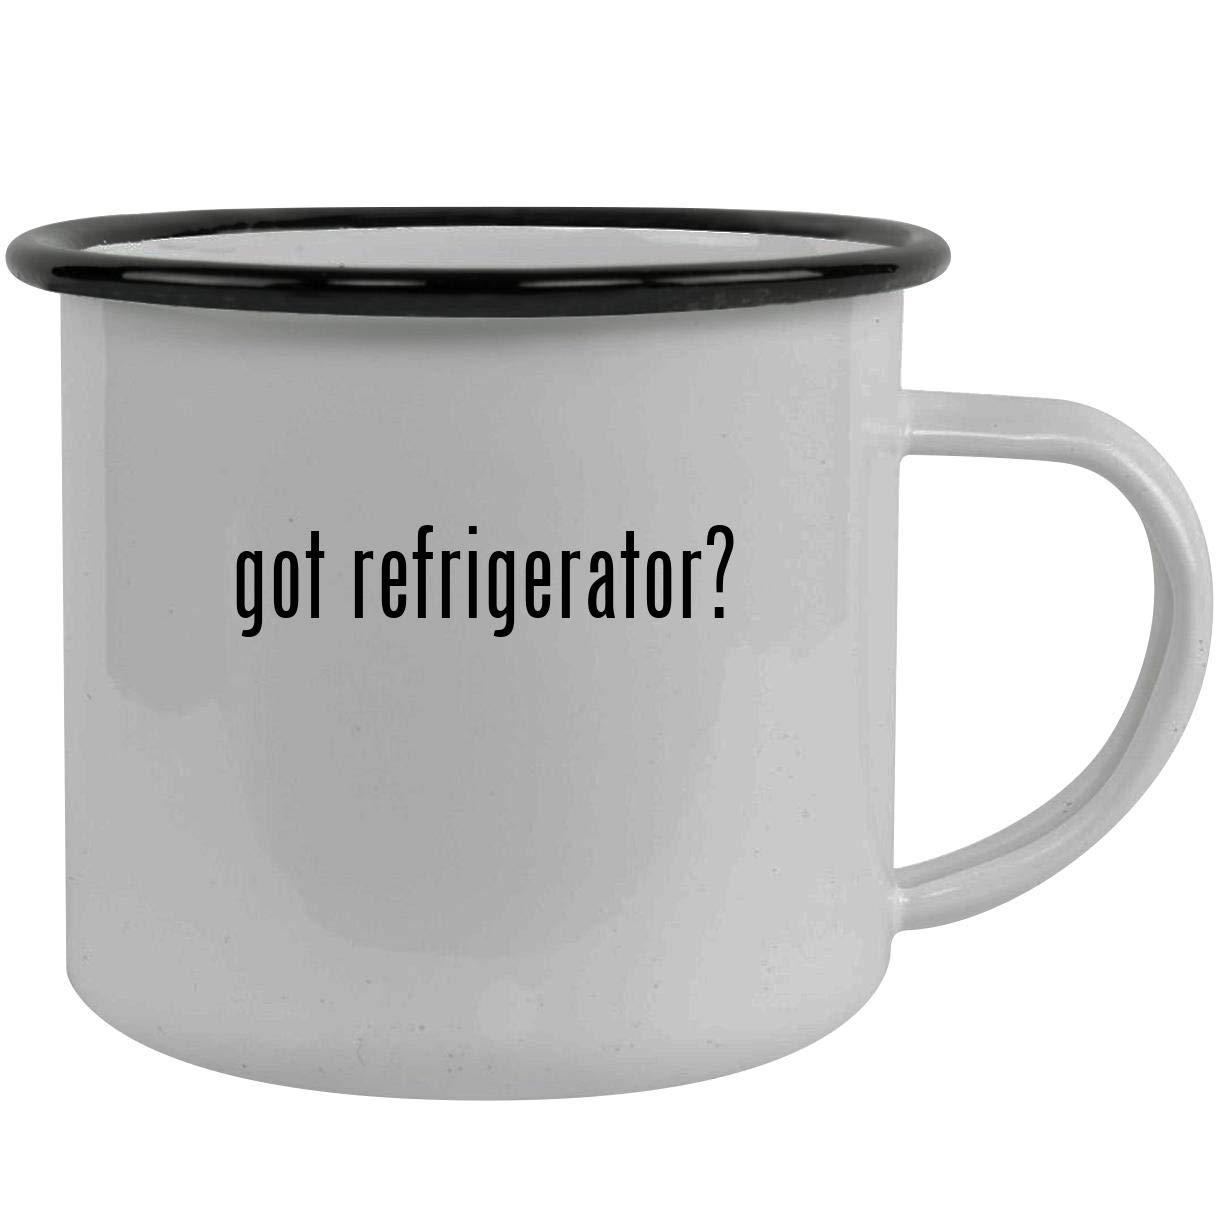 got refrigerator? - Stainless Steel 12oz Camping Mug, Black